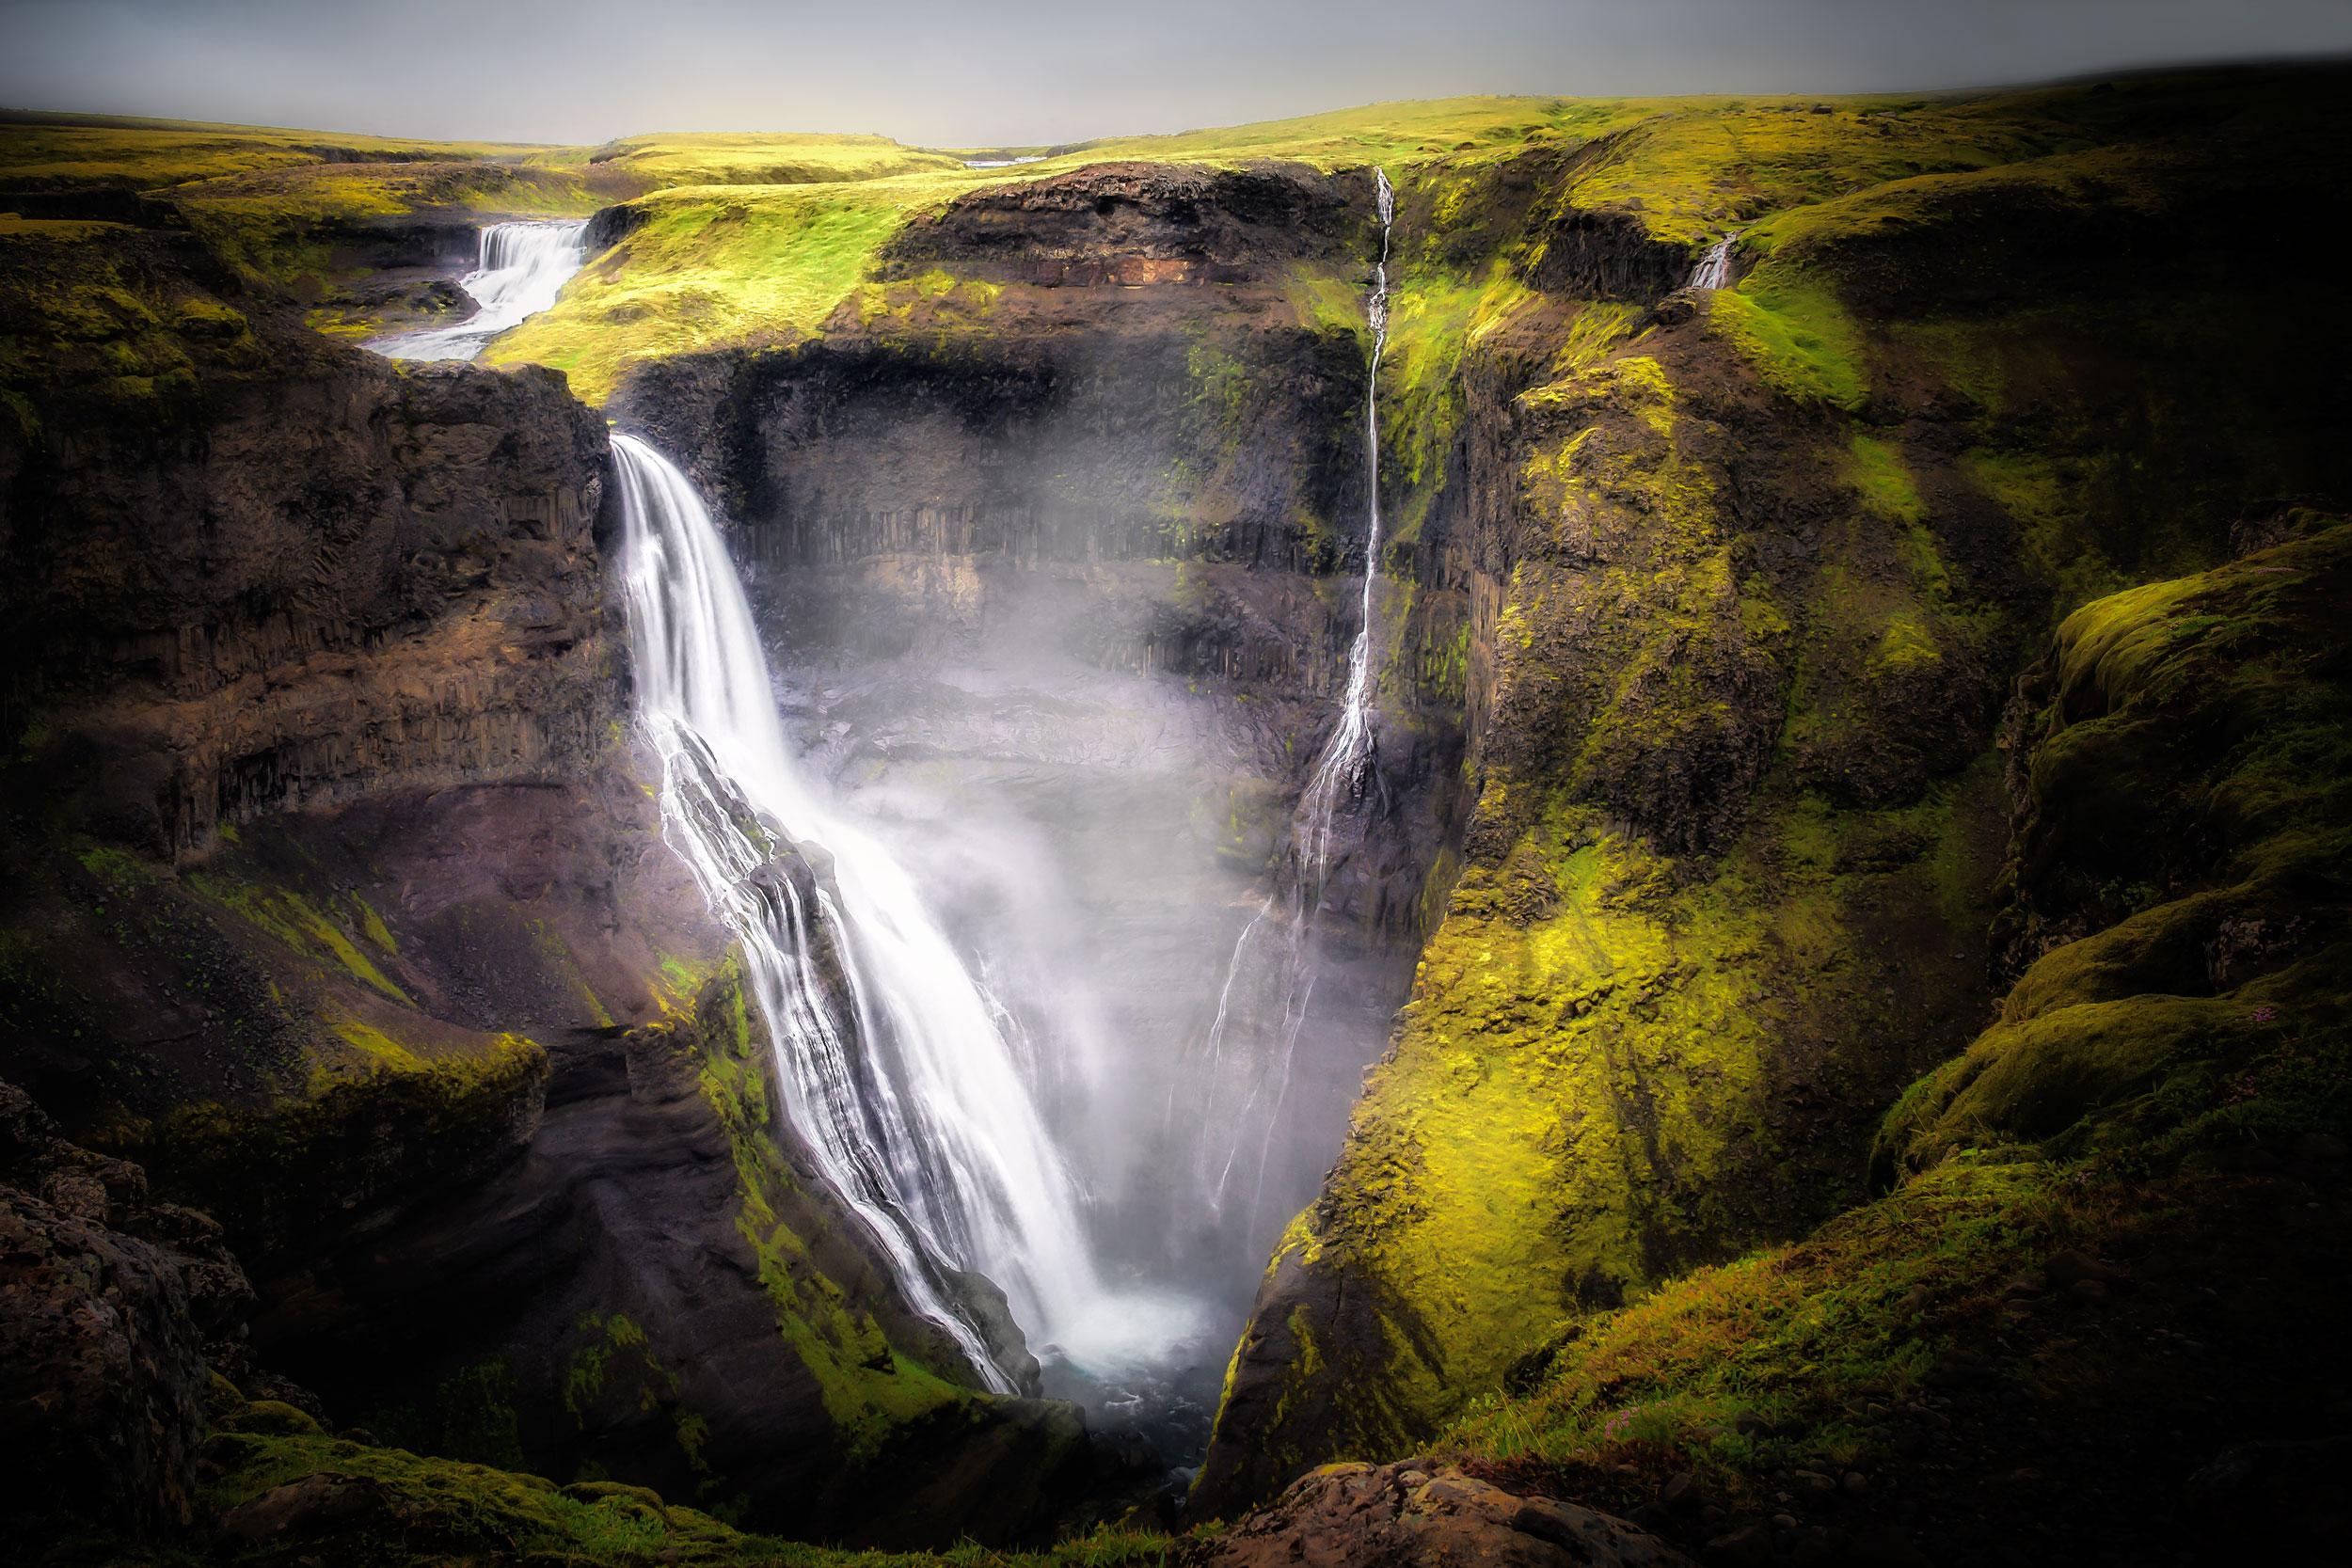 Haifoss Waterfall